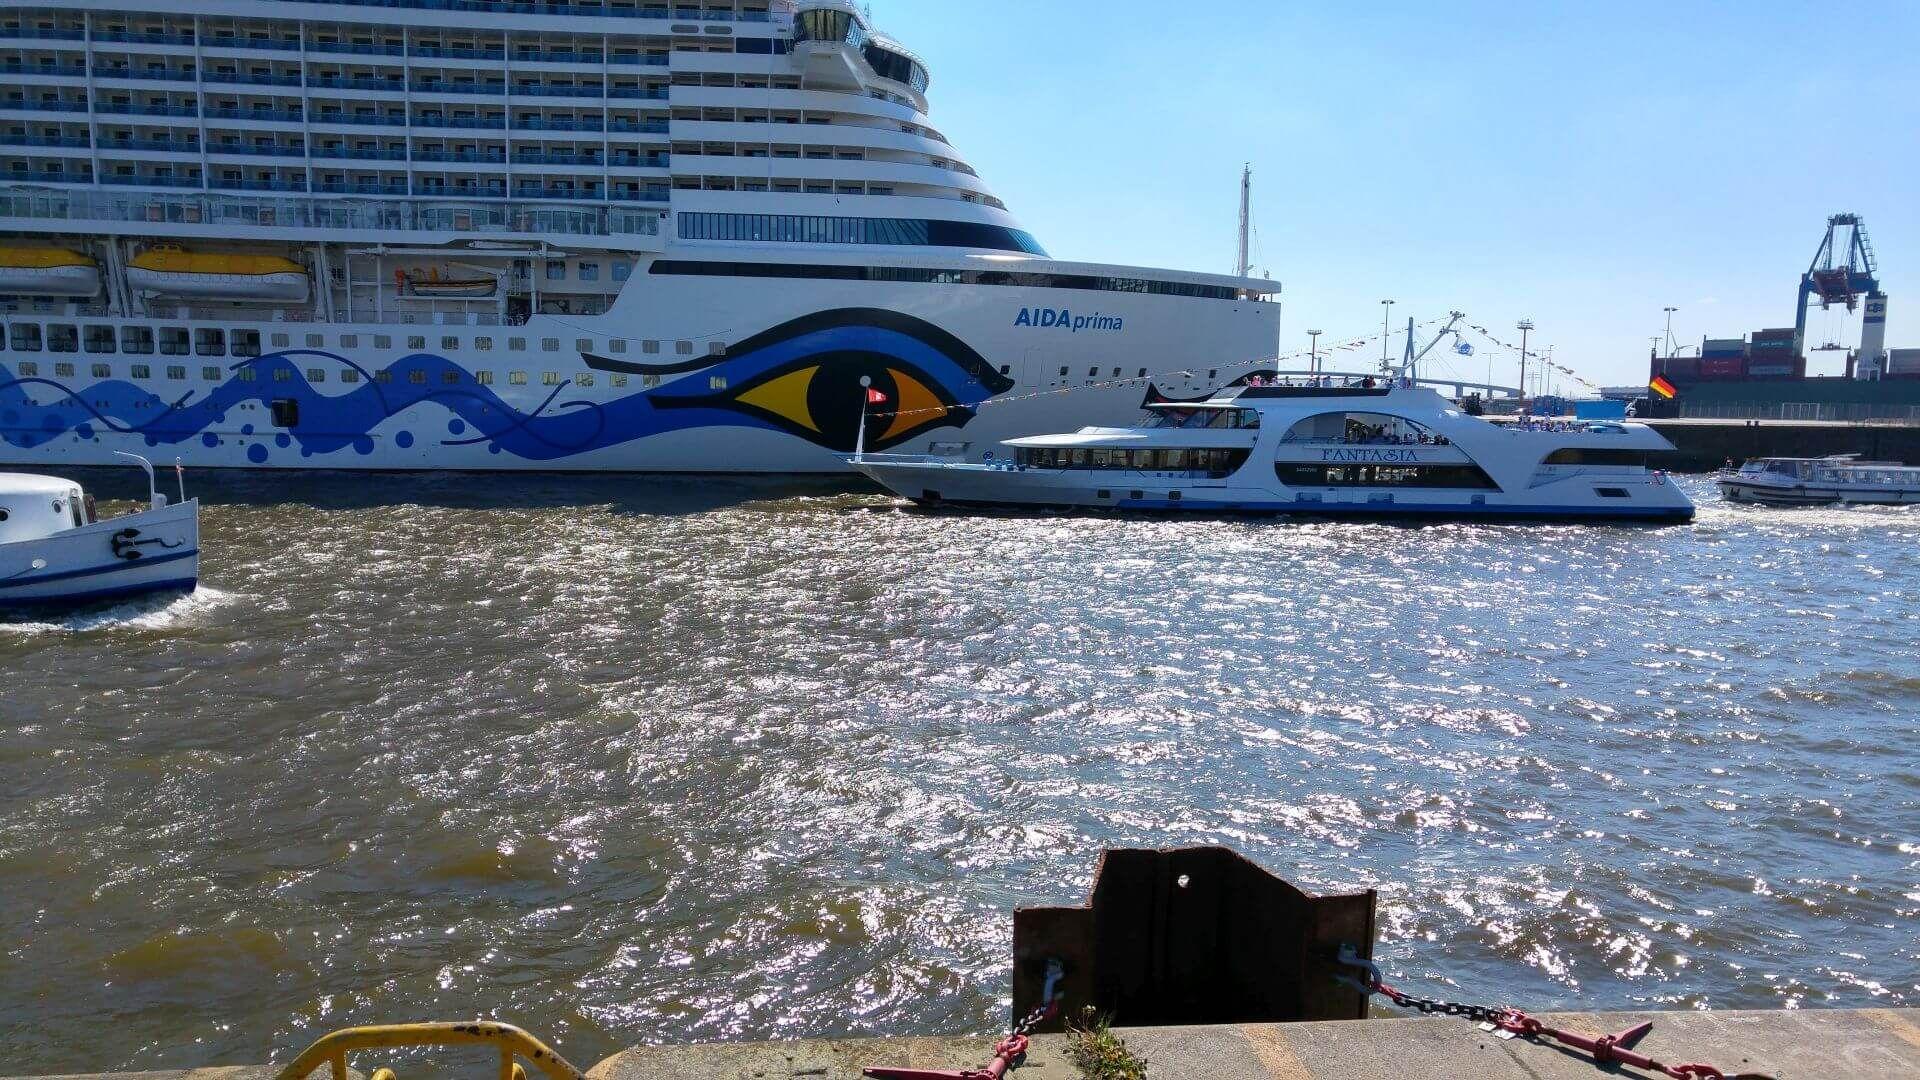 Fot: AIDA in Hamburg